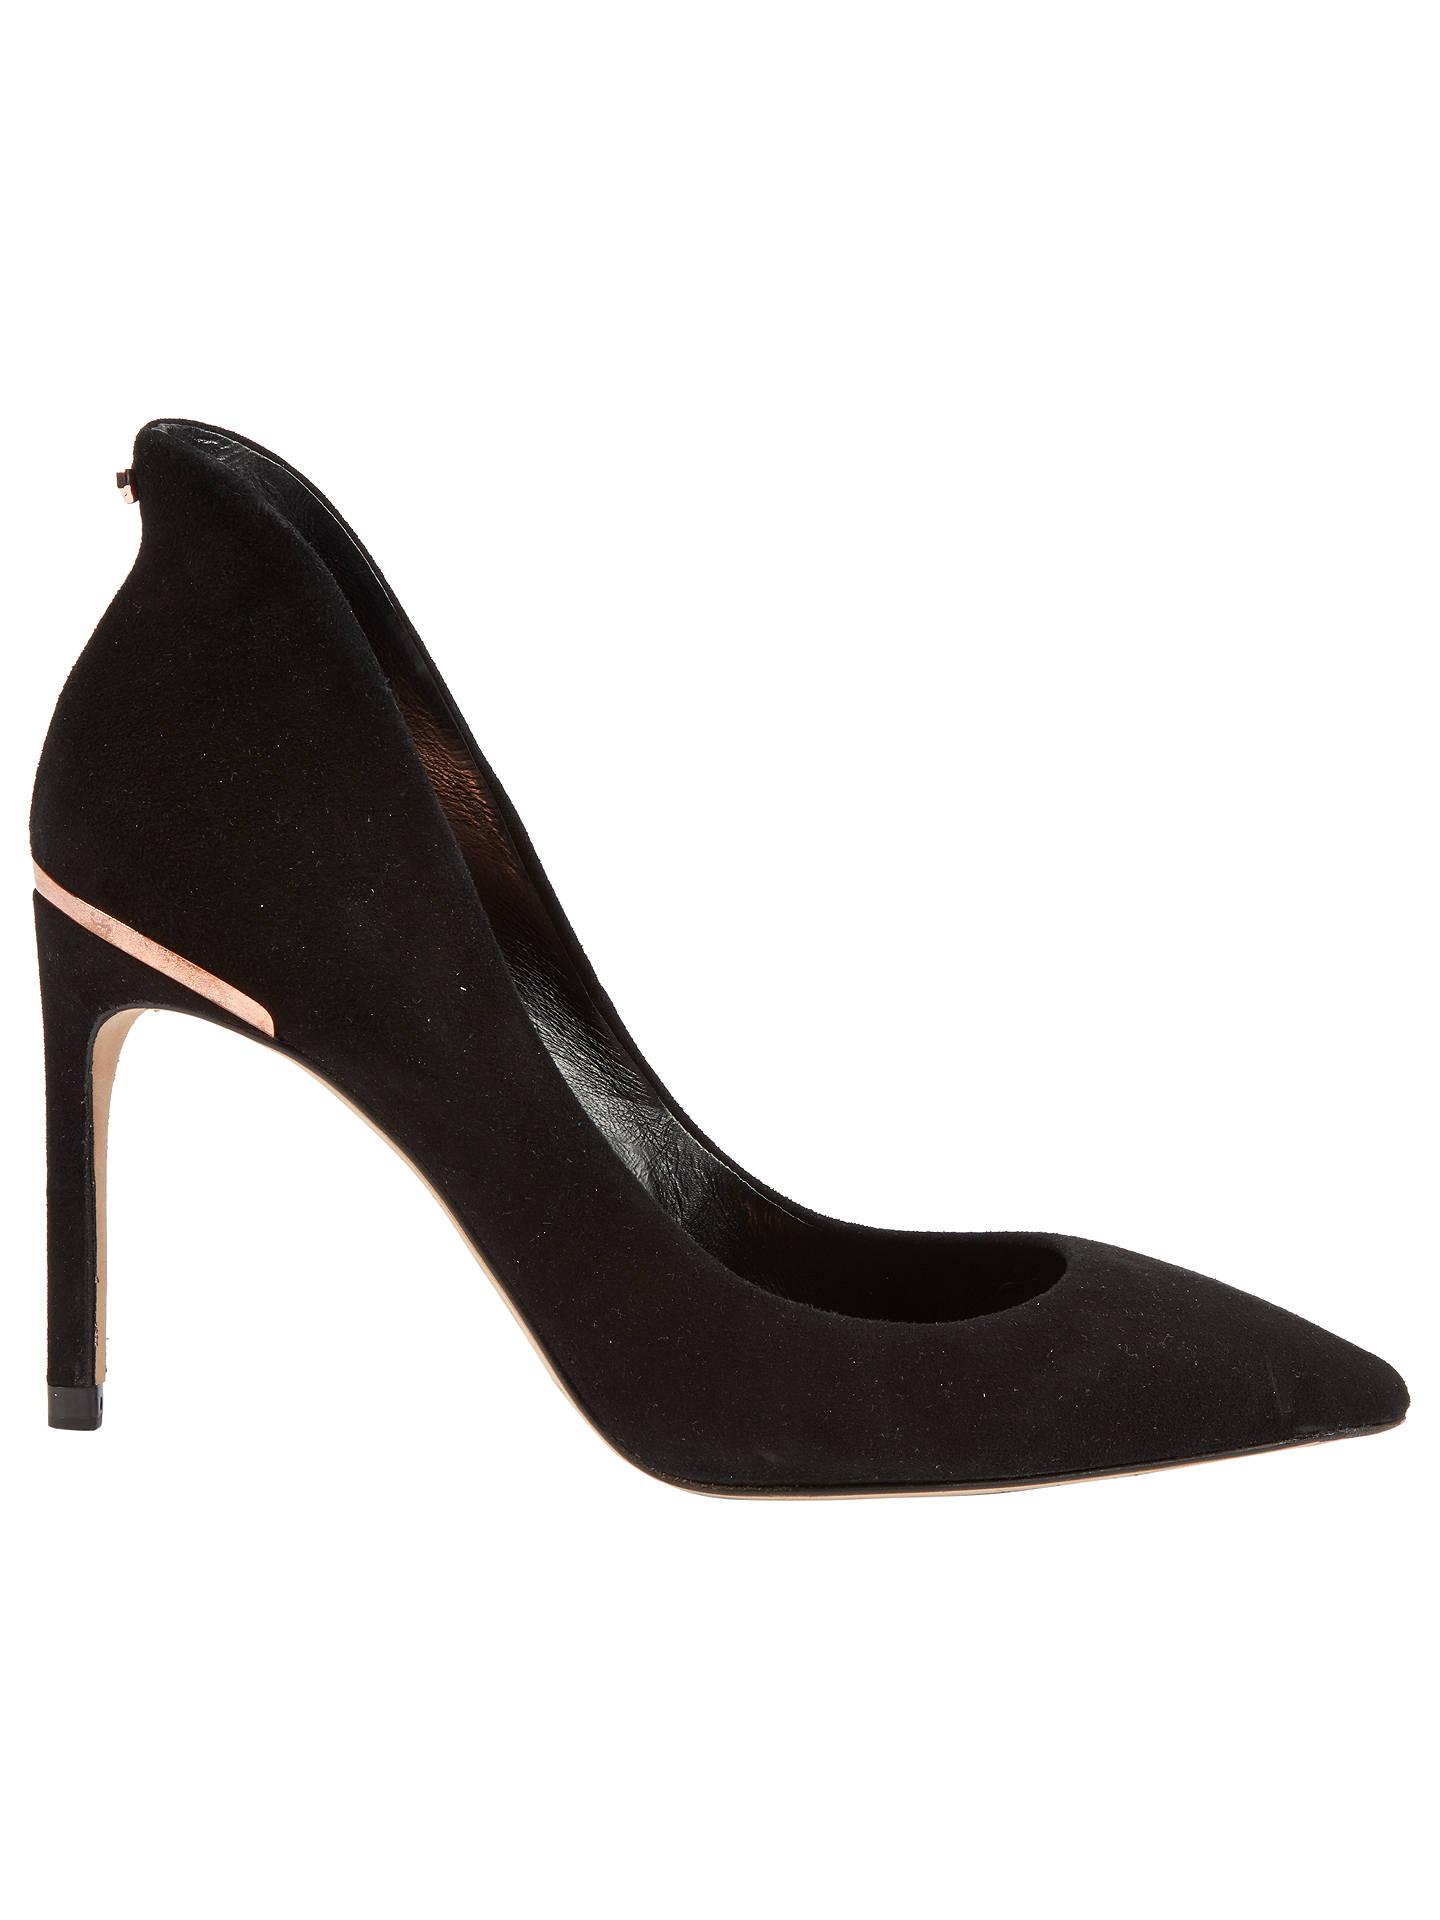 4429dba193c2 Buy Ted Baker Savio Stiletto Heeled Court Shoes